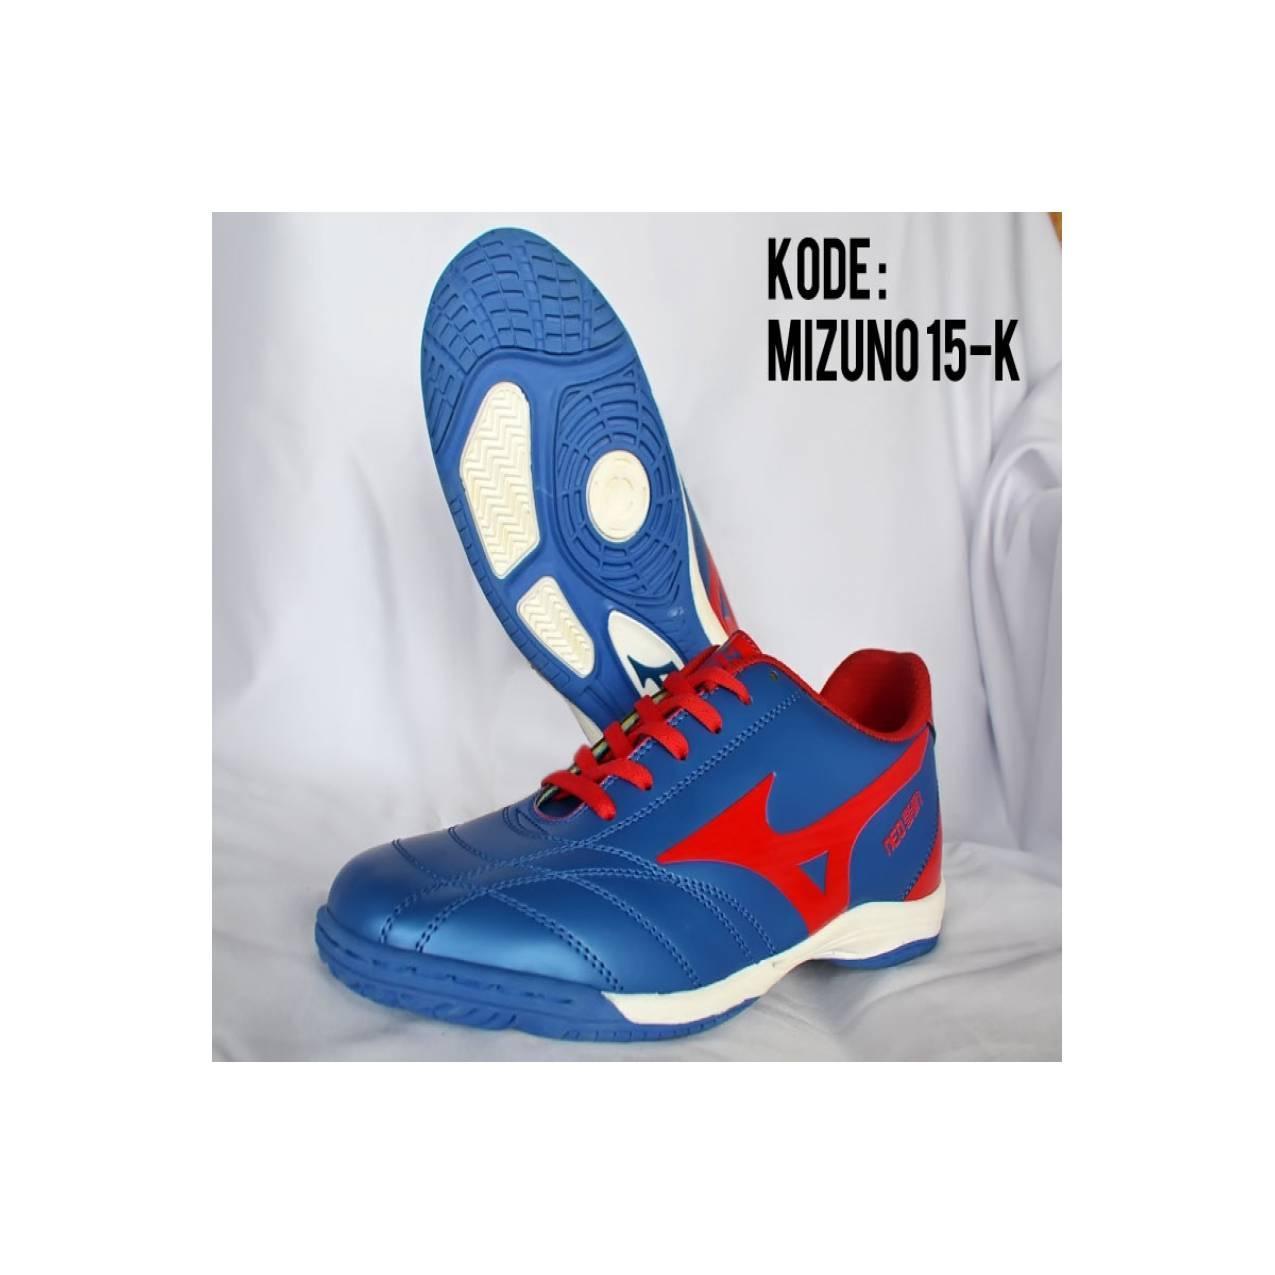 Sepatu Futsal Mizuno KW 1 Kode Mizuno 15K